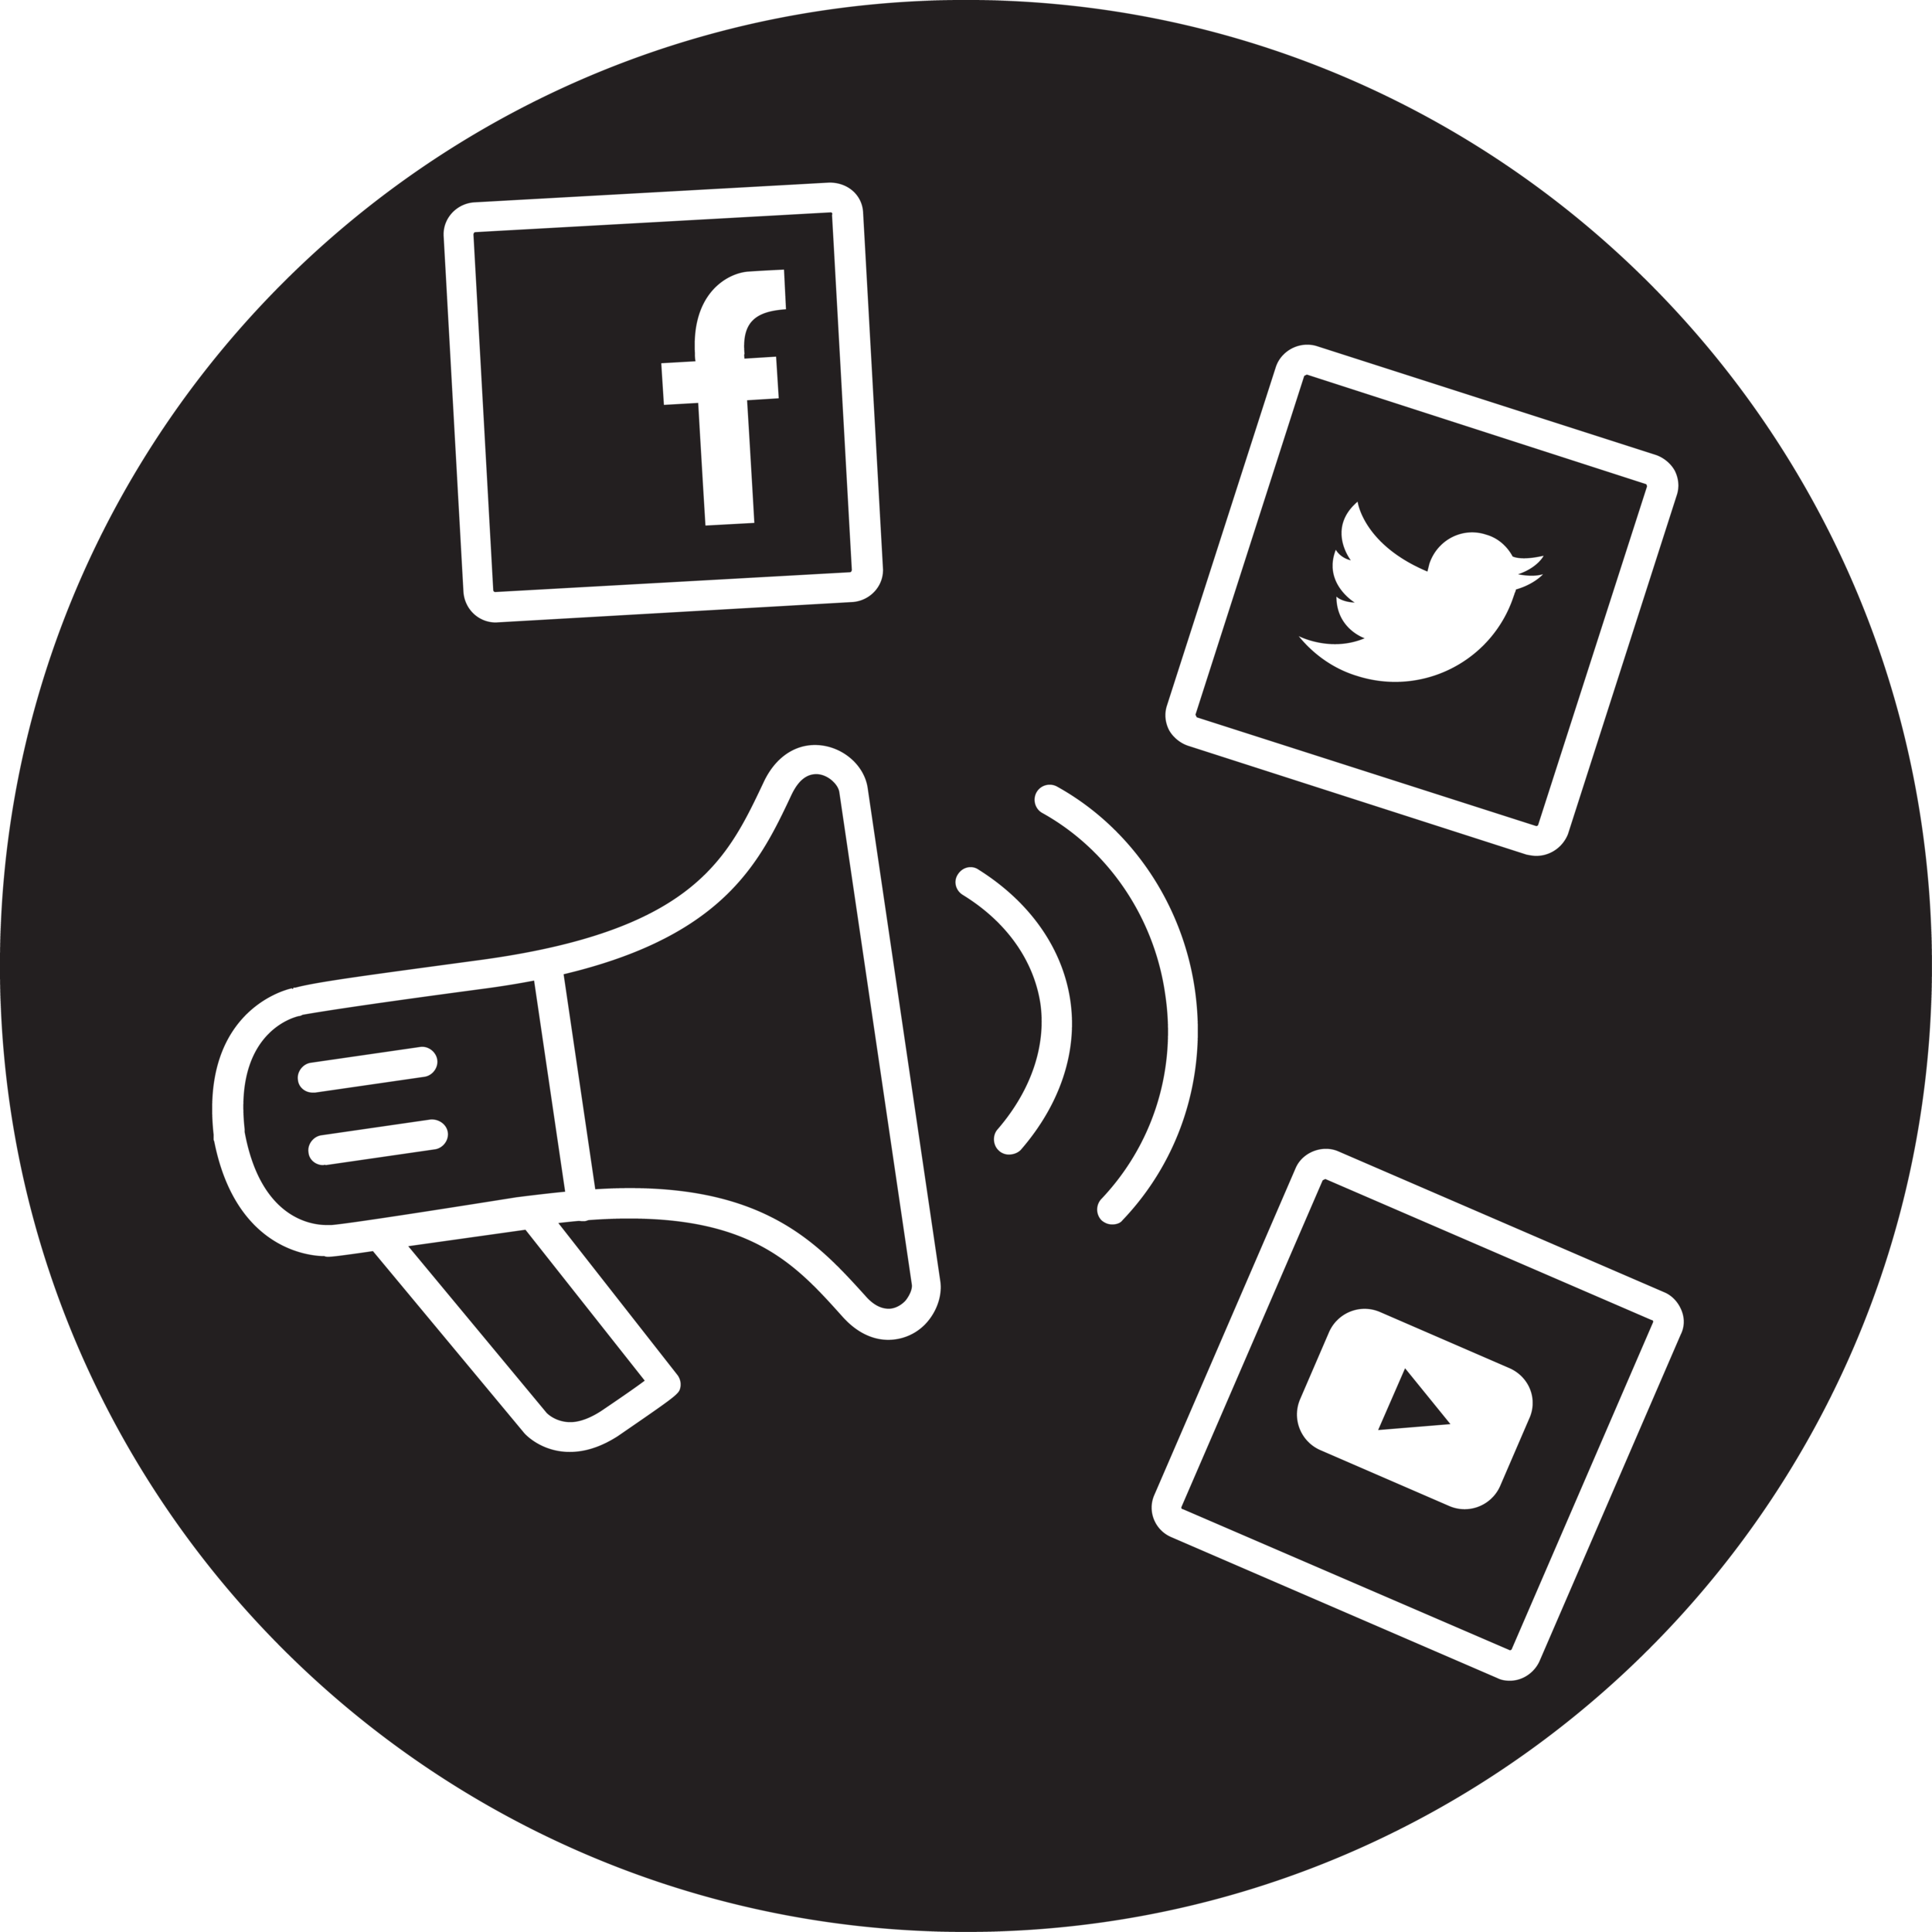 socialmedia-blackcircle.png